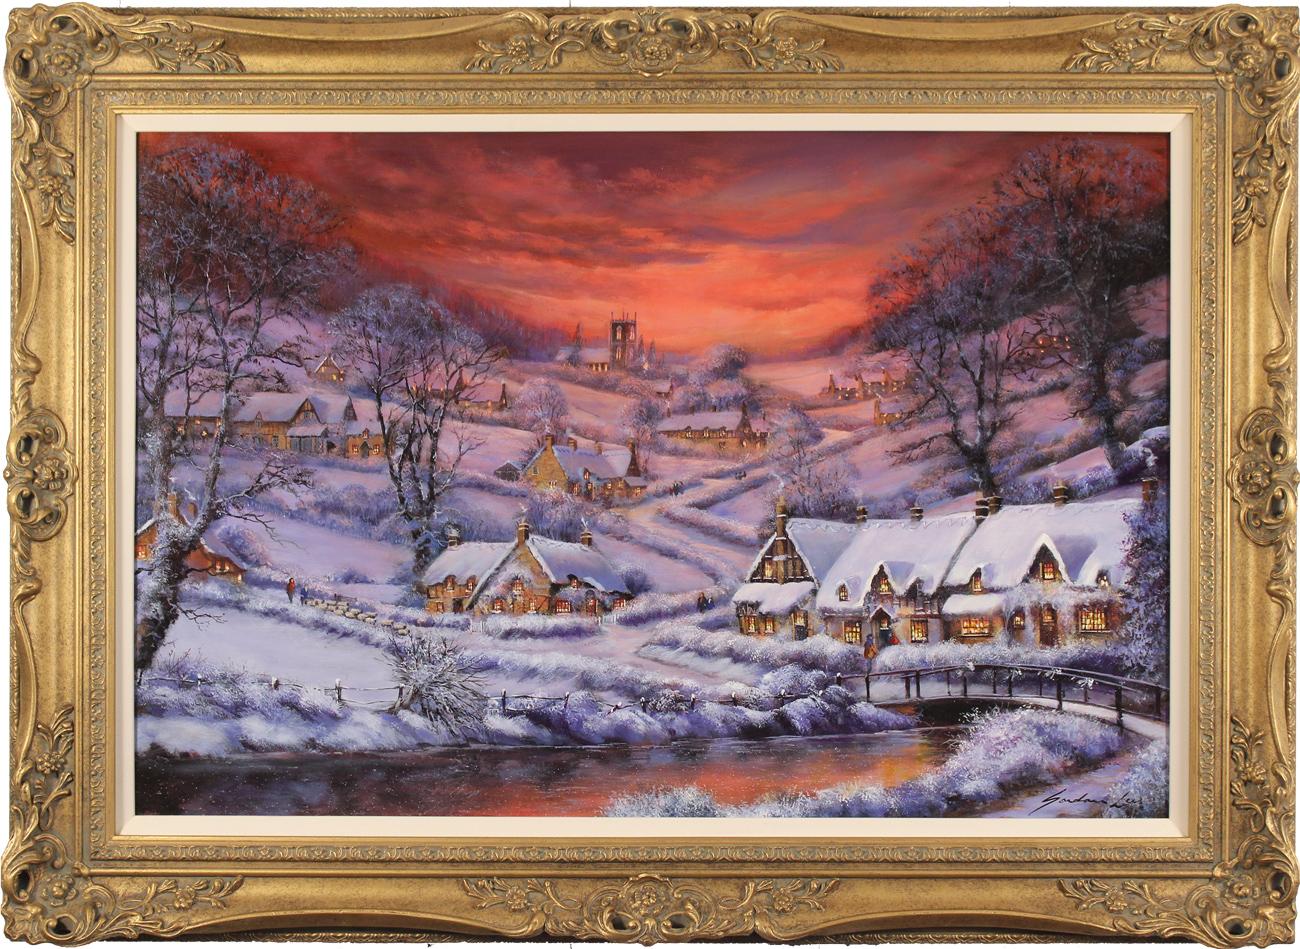 Gordon Lees, Original oil painting on panel, Winter's Splendour, The Cotswolds, click to enlarge